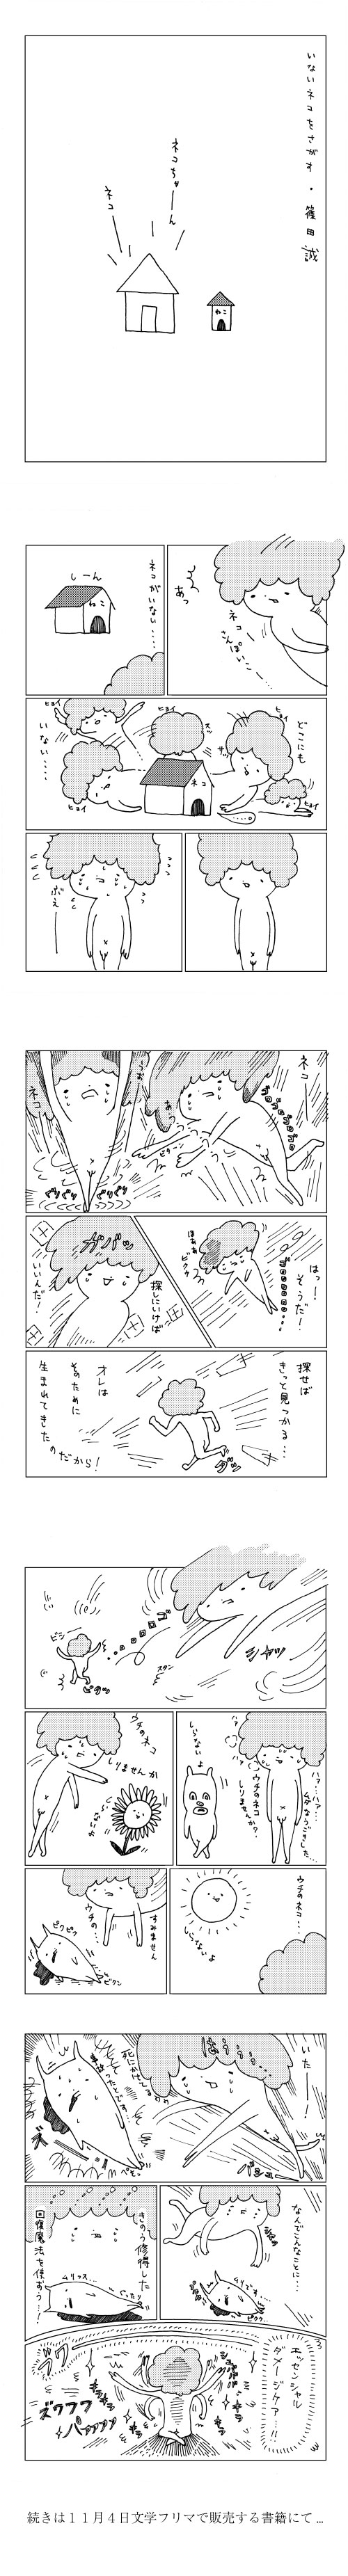 sample_500